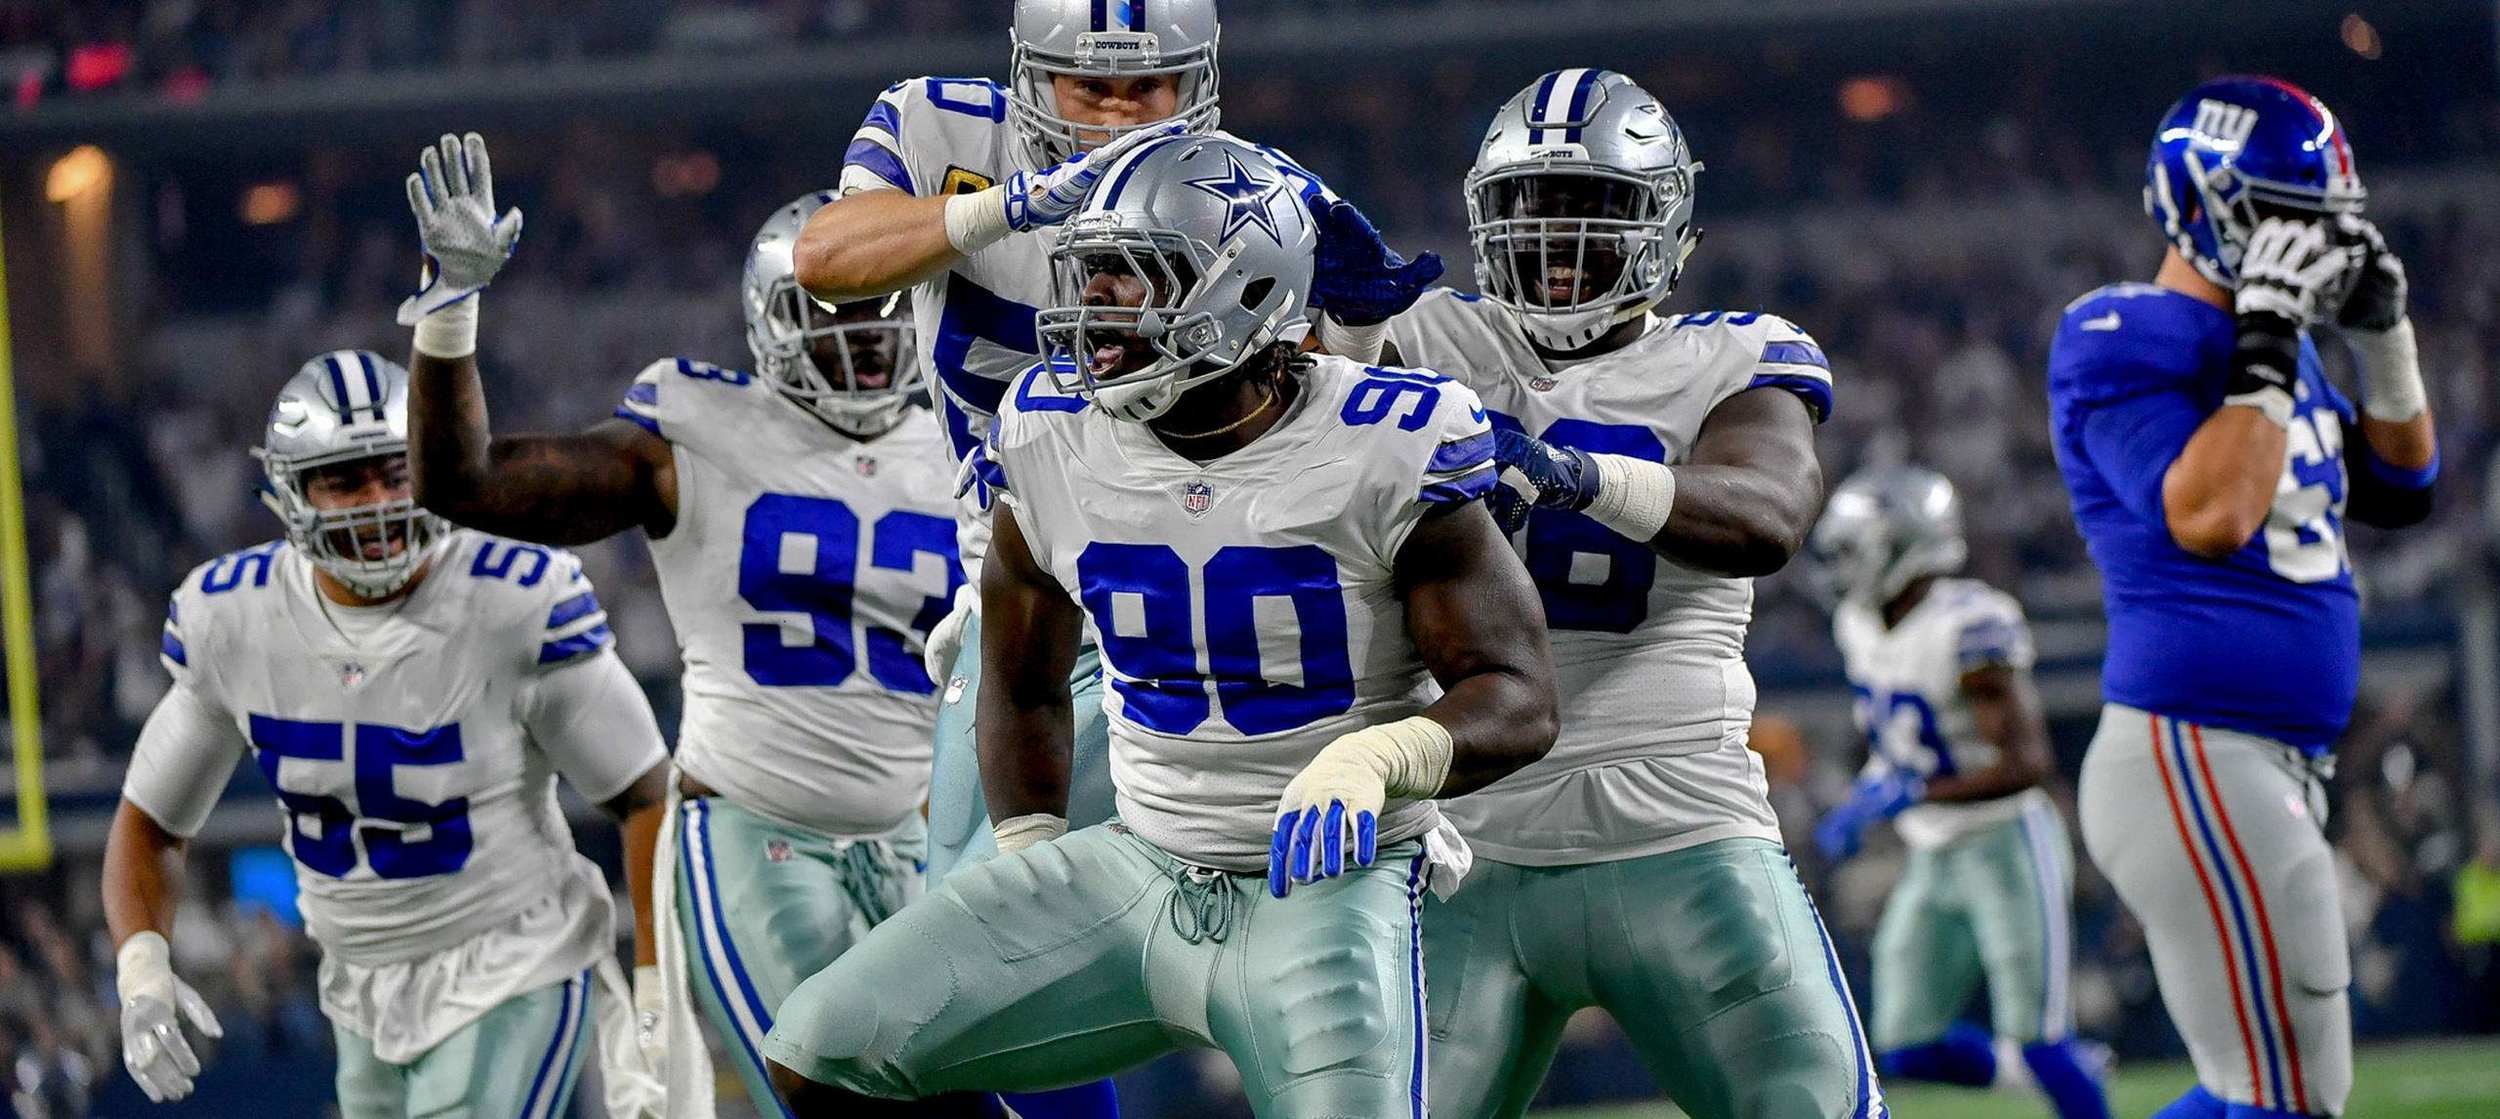 bmartin_star-blog_cowboys-defense-better-or-worse-than-last-season.jpg